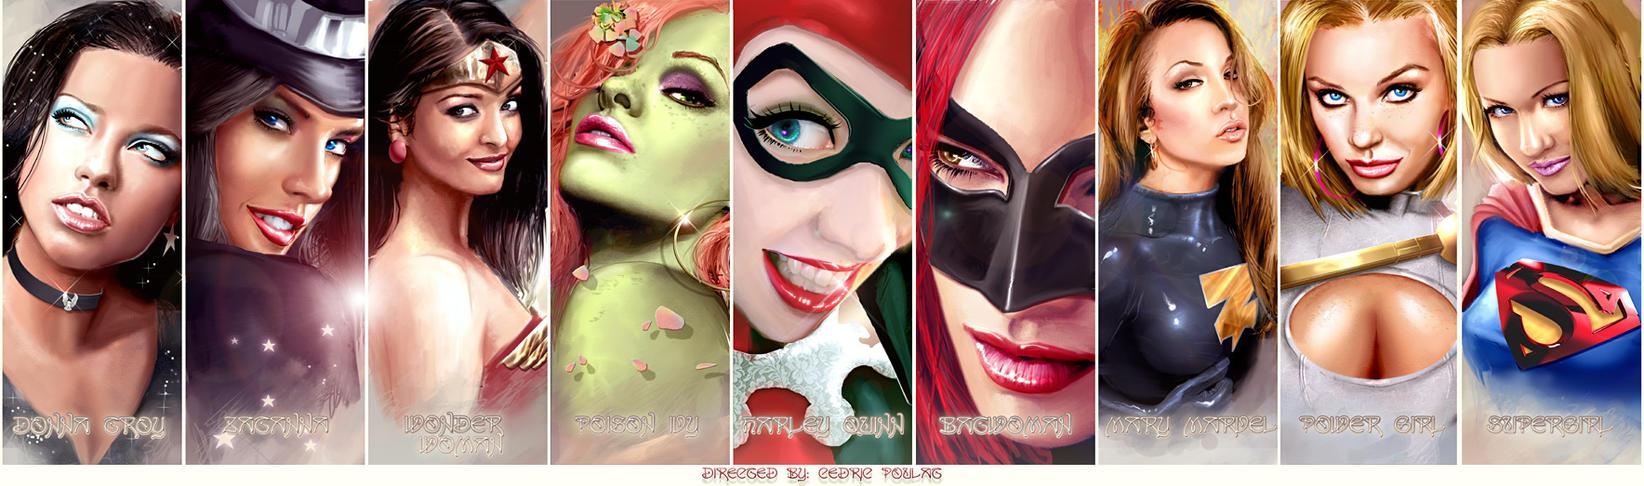 DC WOMEN - FACES by J-Estacado